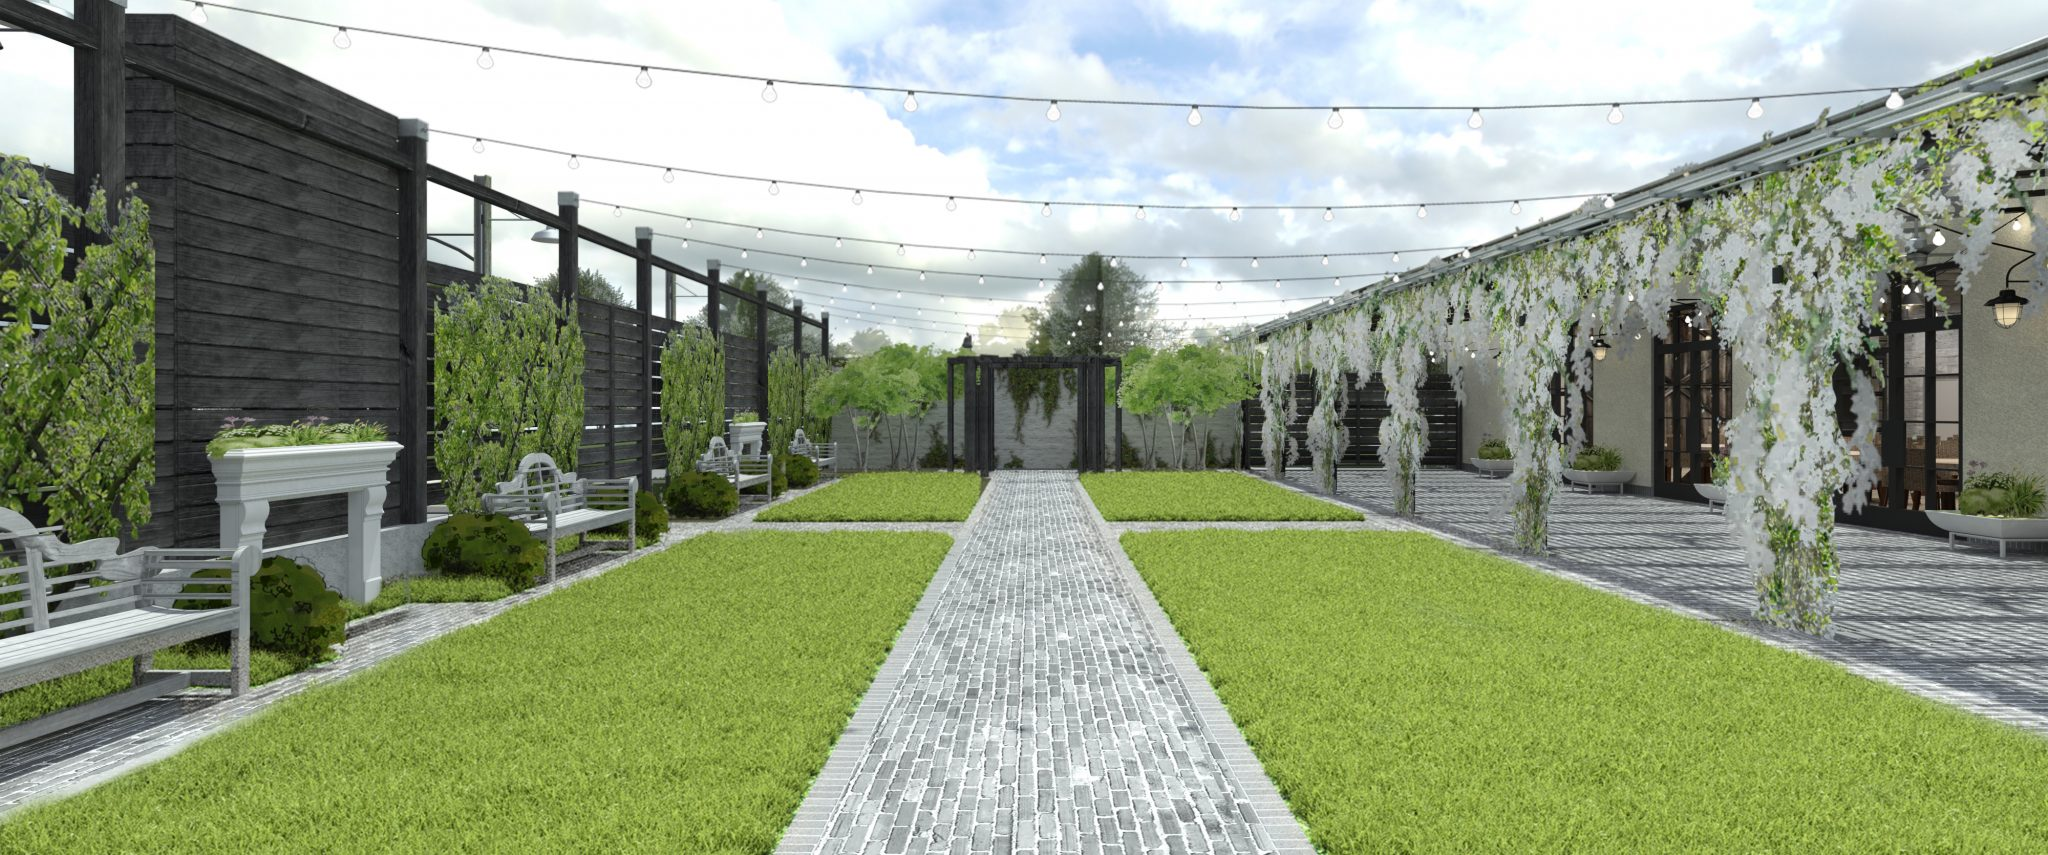 Terrain Gardens Ceremony Space | www.thestyledbride.com